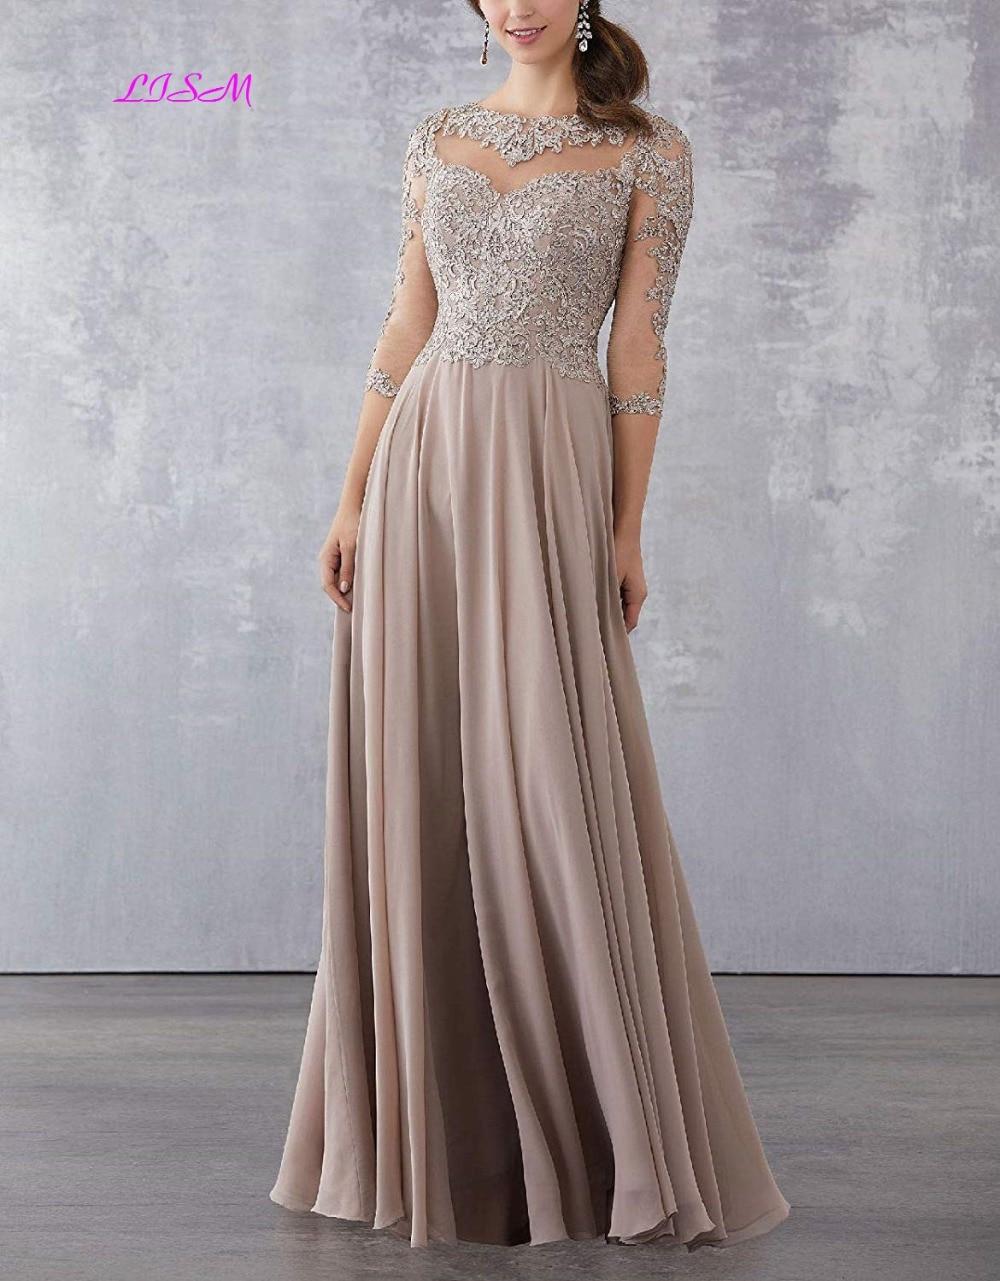 Lace Applique Beaded Mother of the Bride Dresses Elegant Three Quarter Sleeve Long Chiffon Evening Formal Maxi Dress